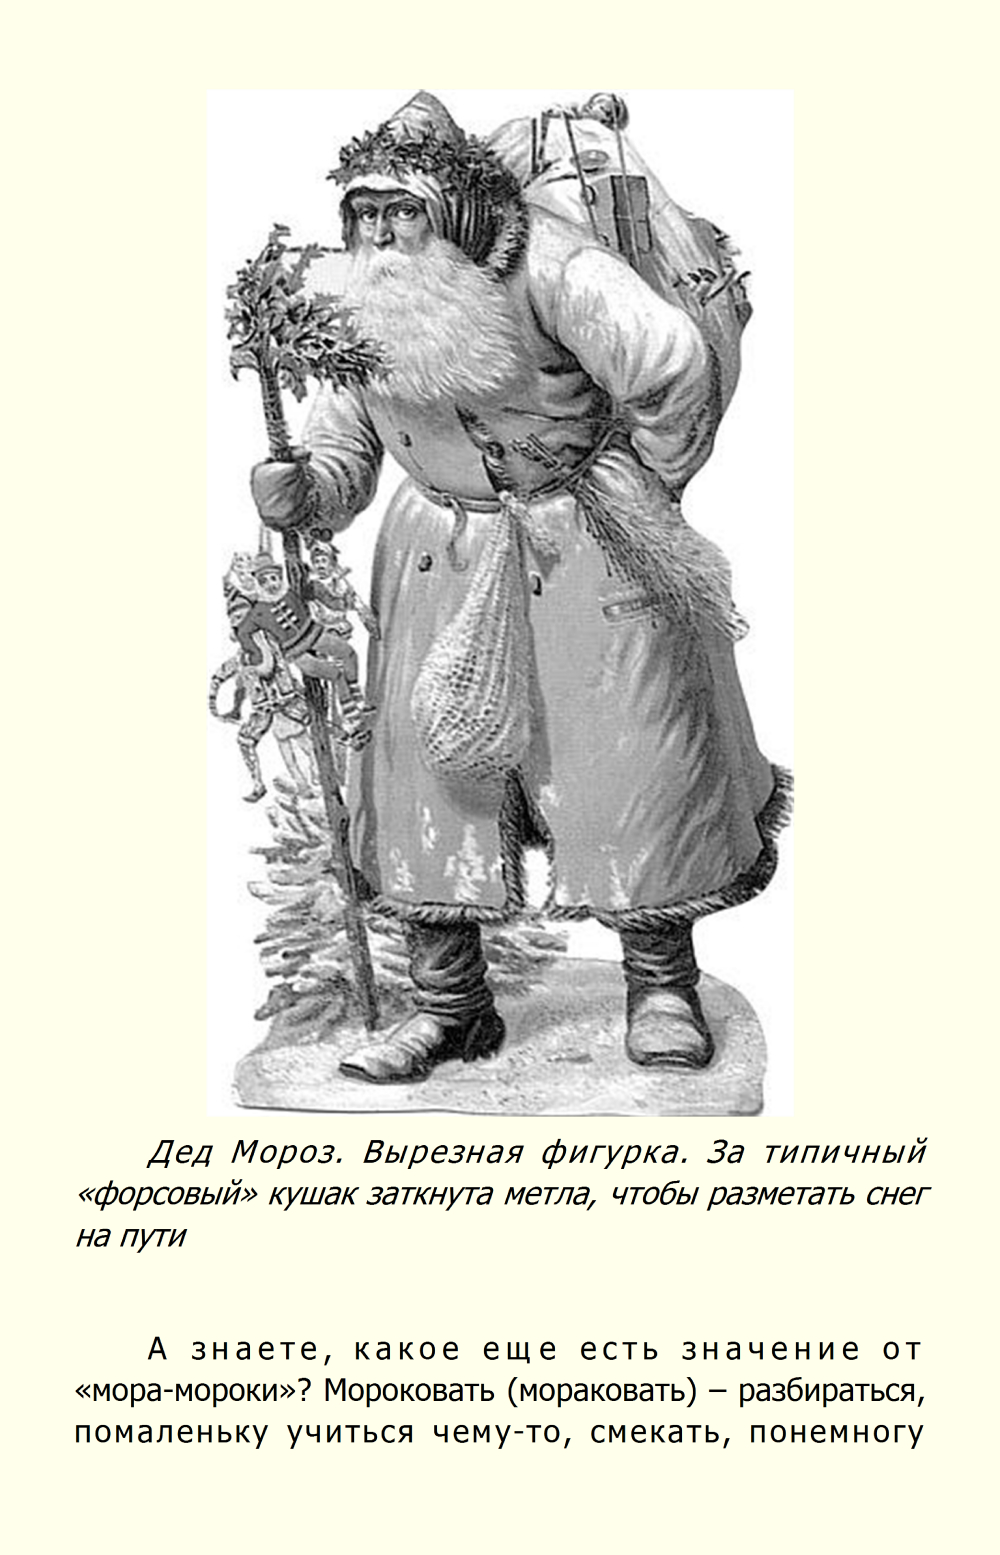 http://i3.imageban.ru/out/2014/01/25/93b01b4f74dab73477df6e0c04532cee.jpg